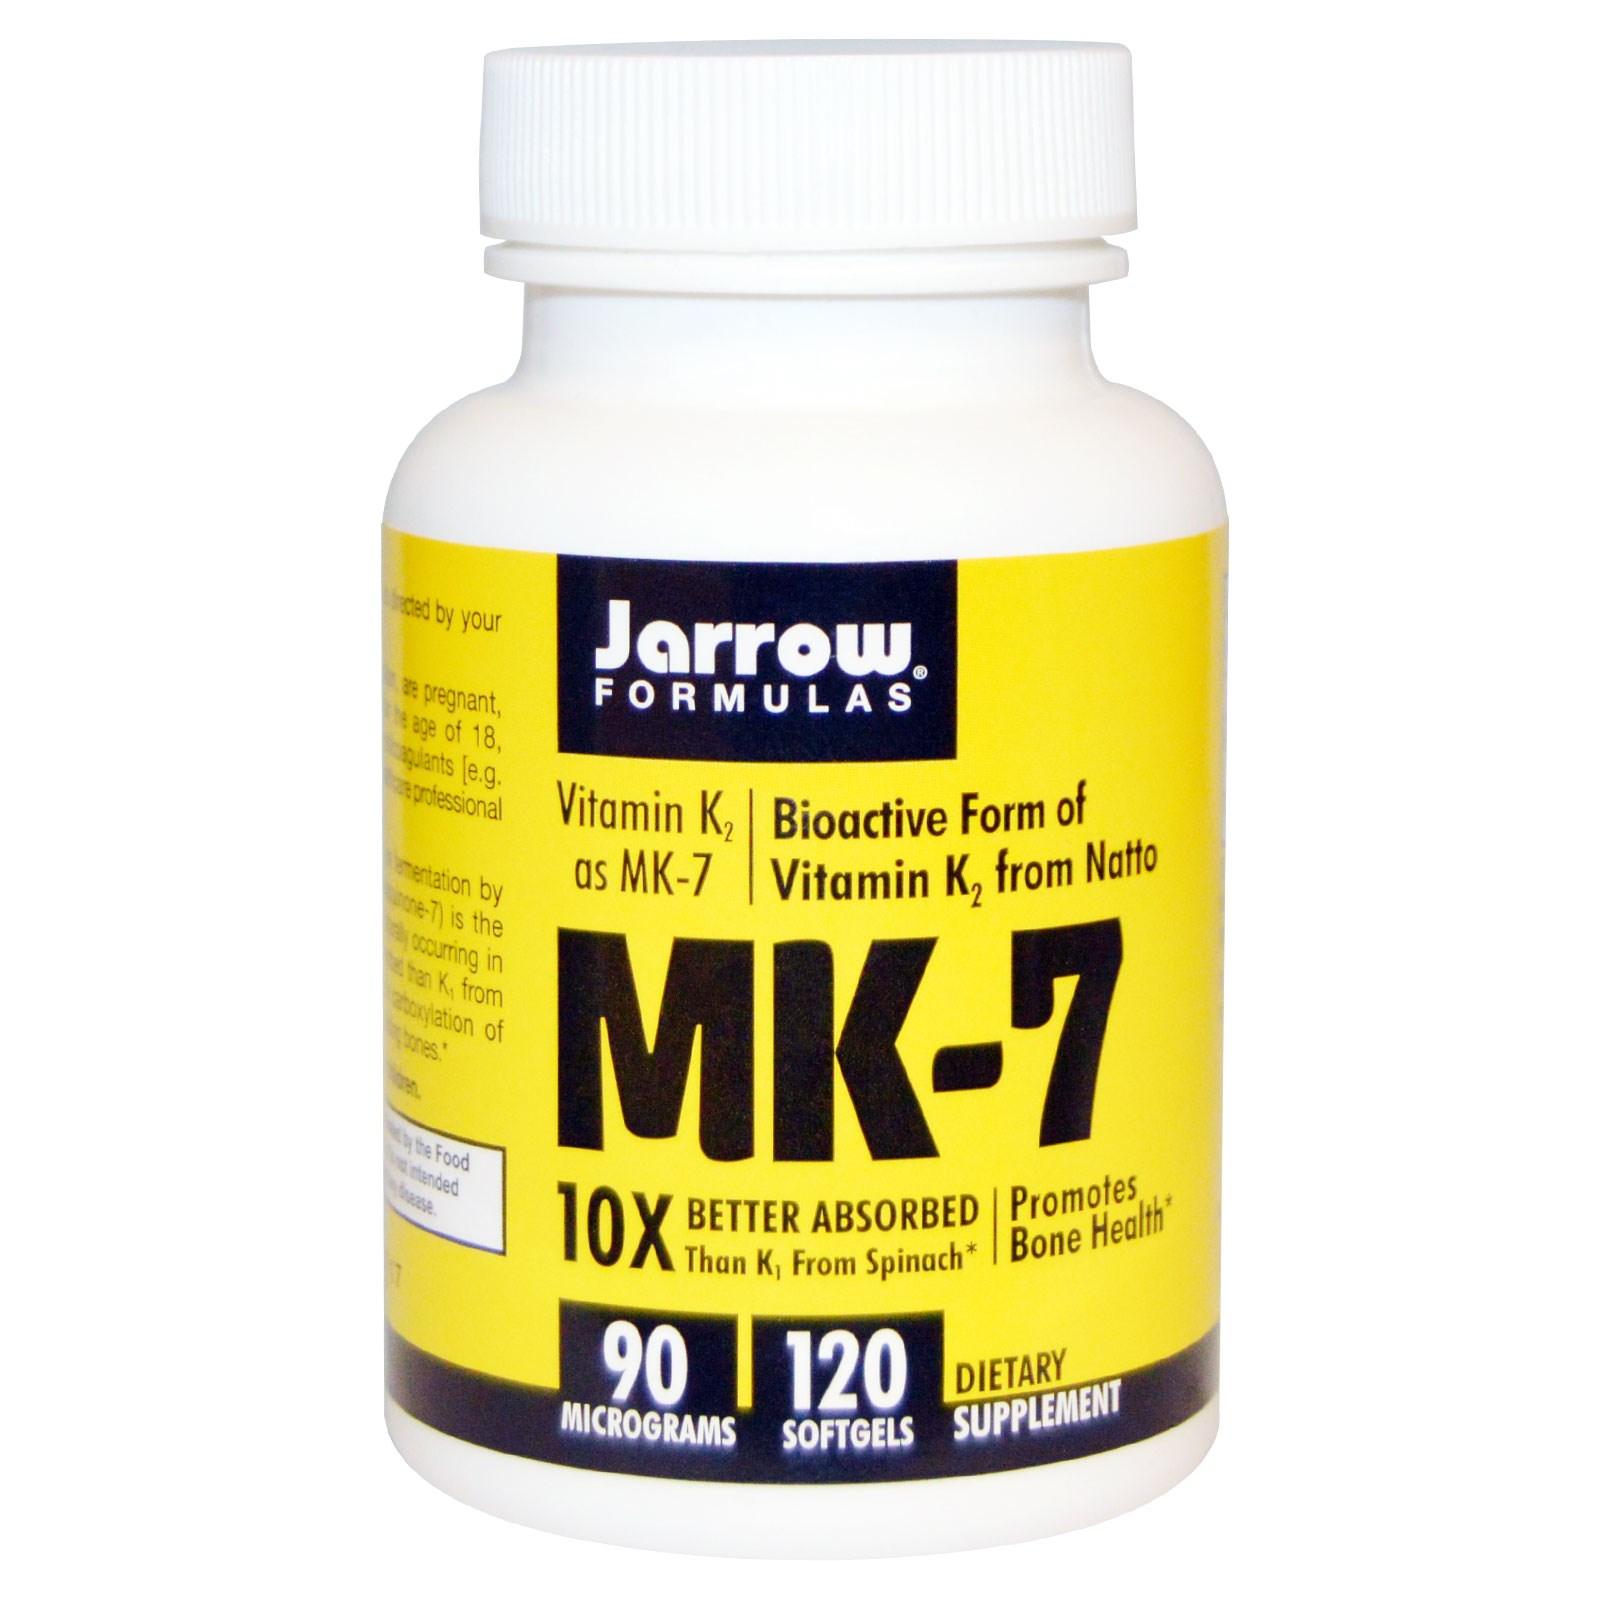 Image of MK-7 vitamine K2 comme MK-7, 90 mcg (120 gélules) - Jarrow Formulas